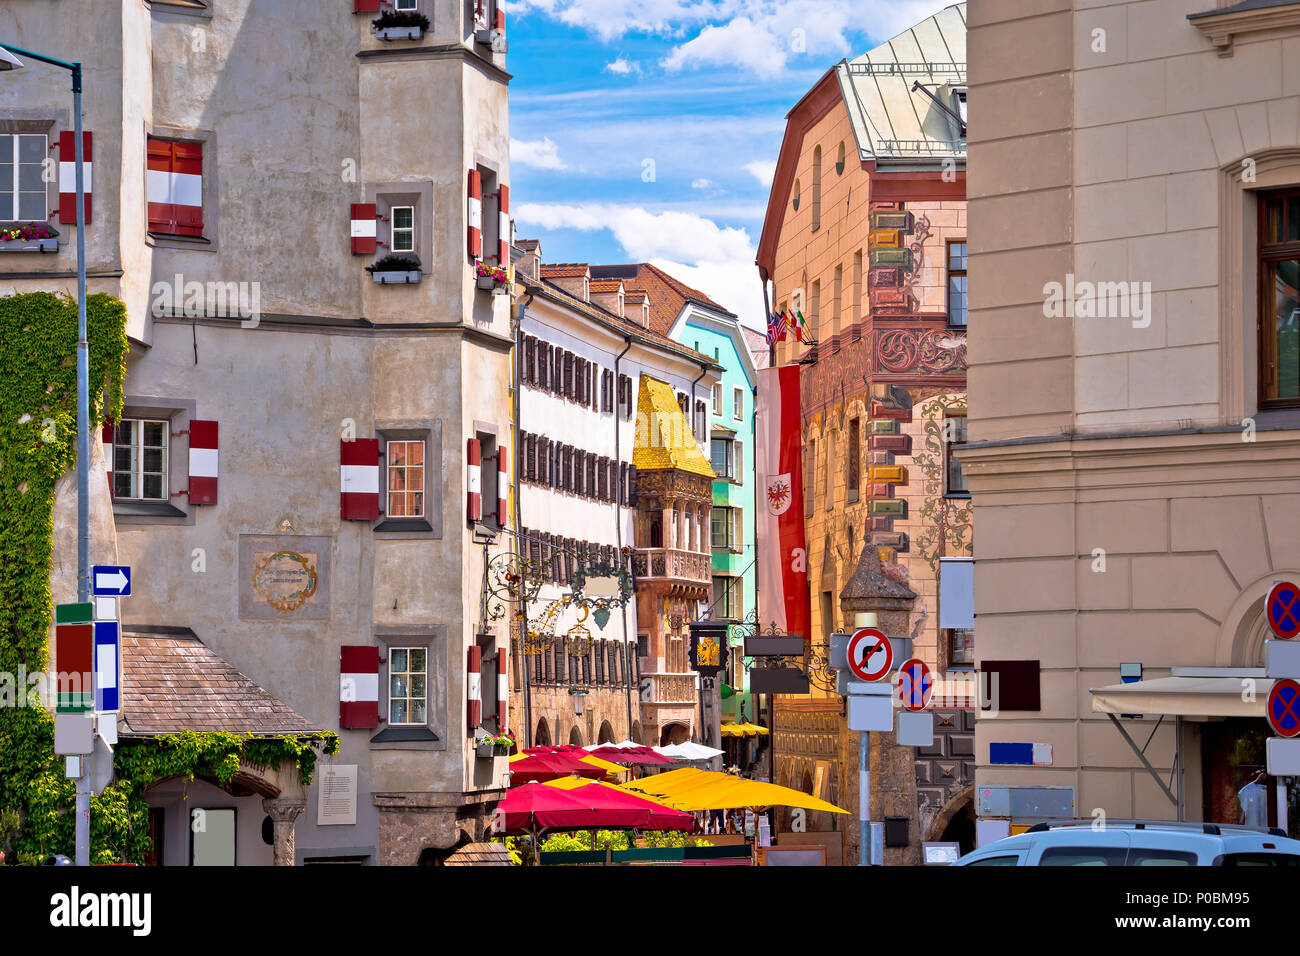 Historic street of Innsbruck view, alpine city in Tirol, region of Austria - Stock Image